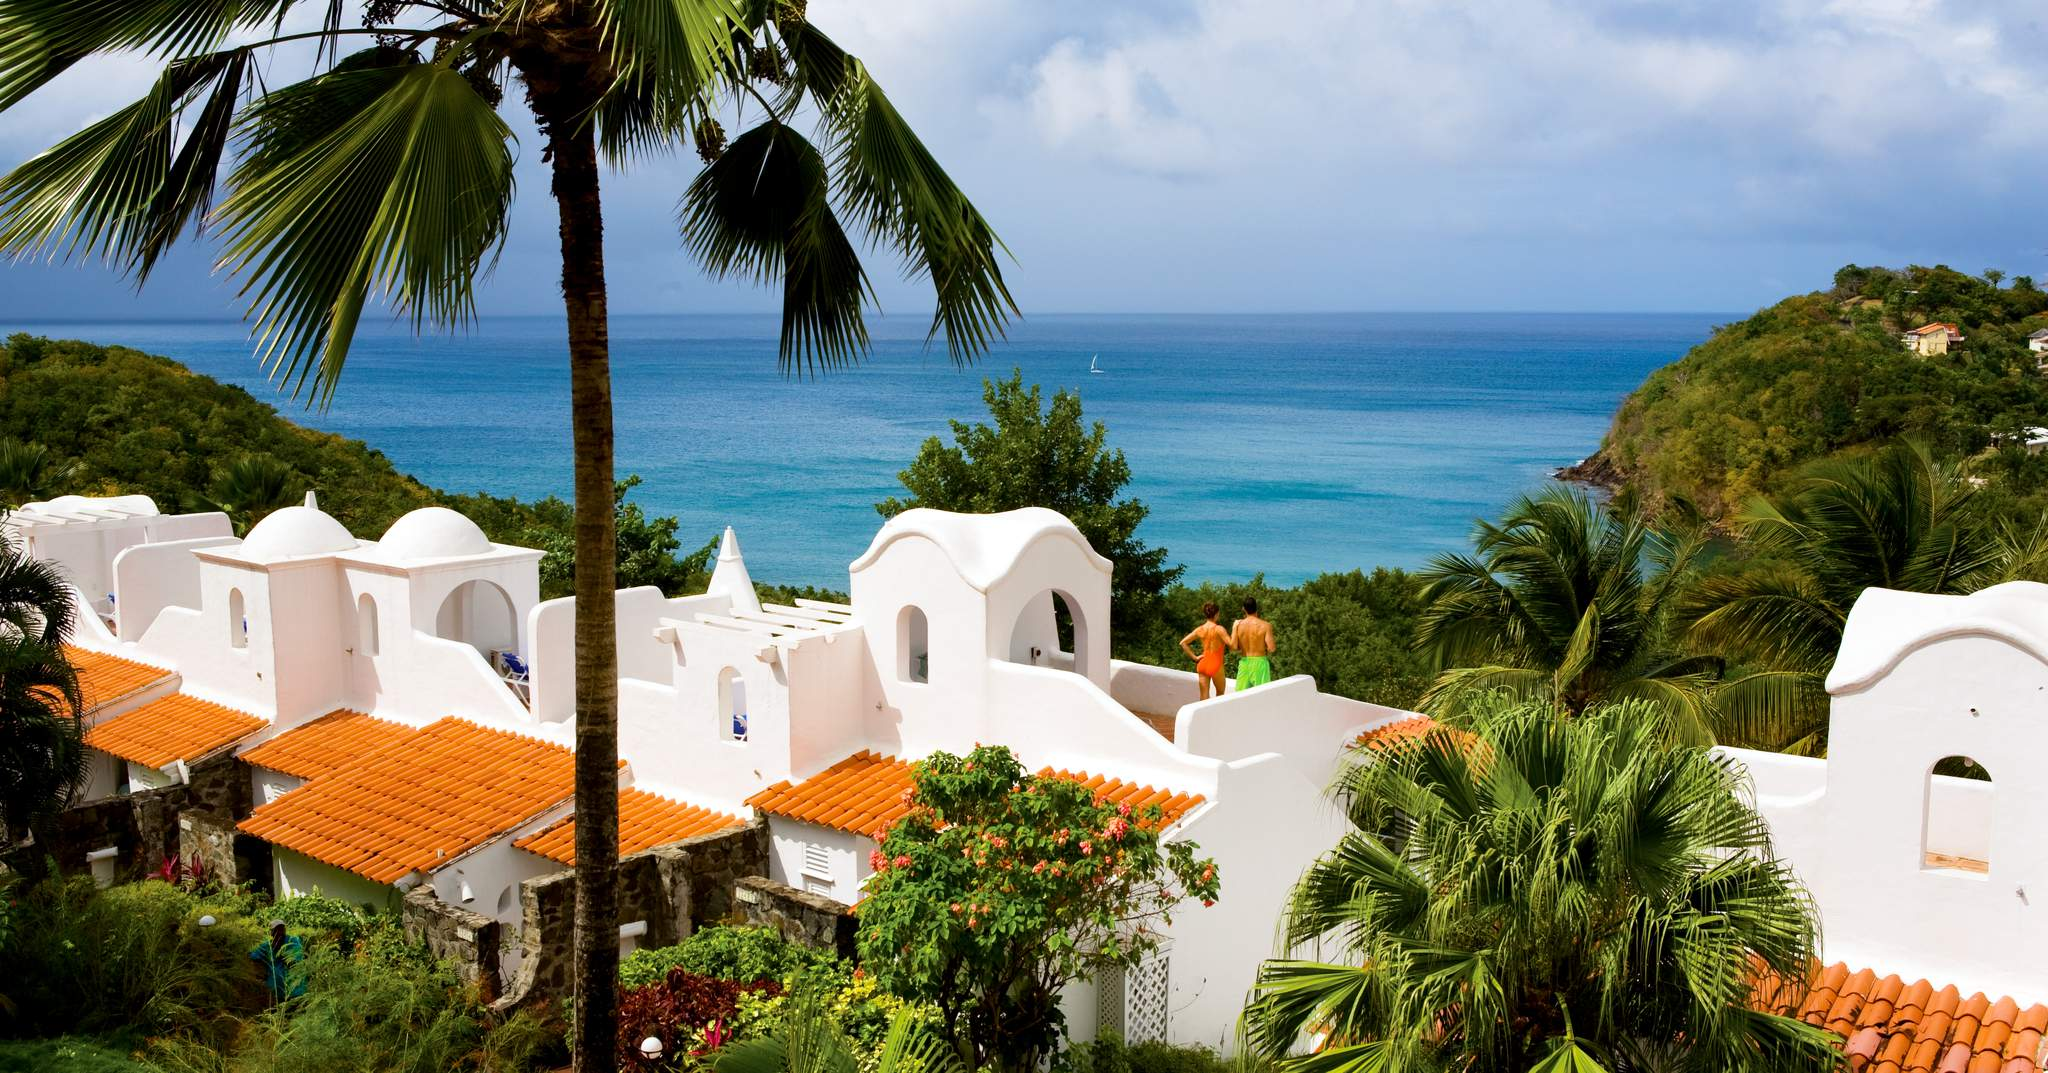 Windjammer Landing Villa Beach Resort in Castries Saint